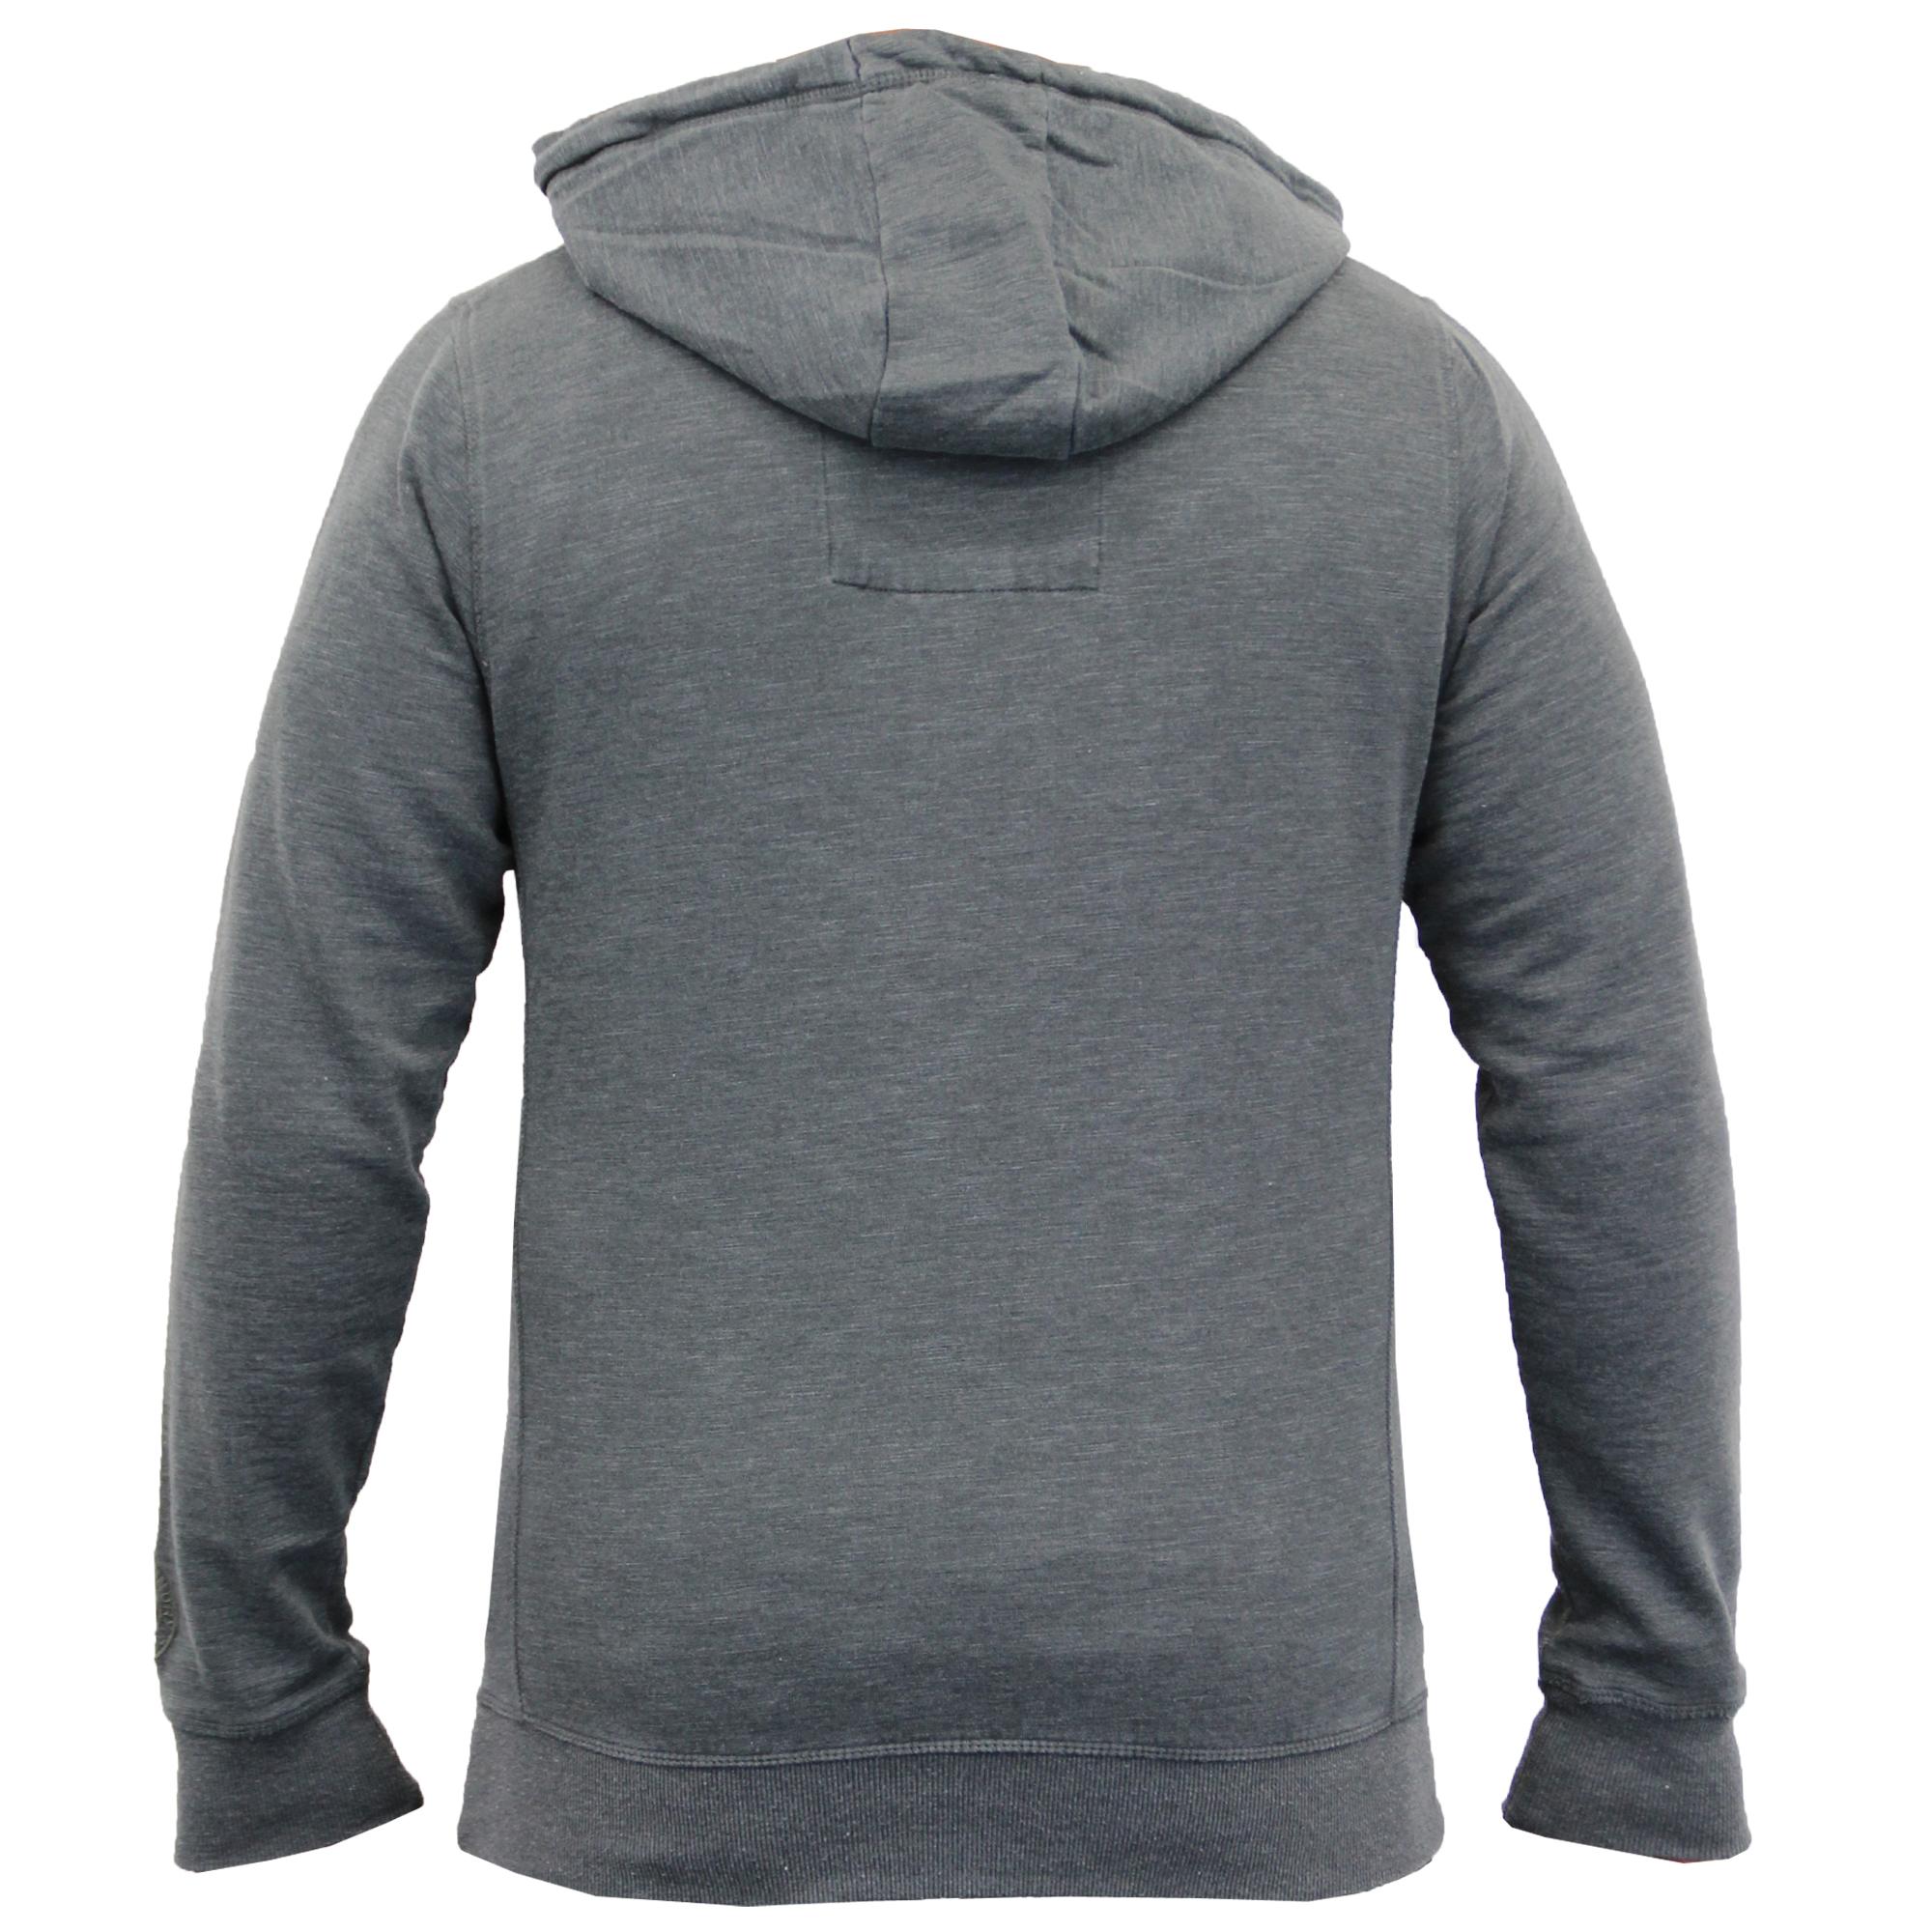 Mens-Sweatshirt-Tokyo-Laundry-Hooded-Top-Sweat-Applique-Zip-Gym-Fleece-Lined-New thumbnail 14